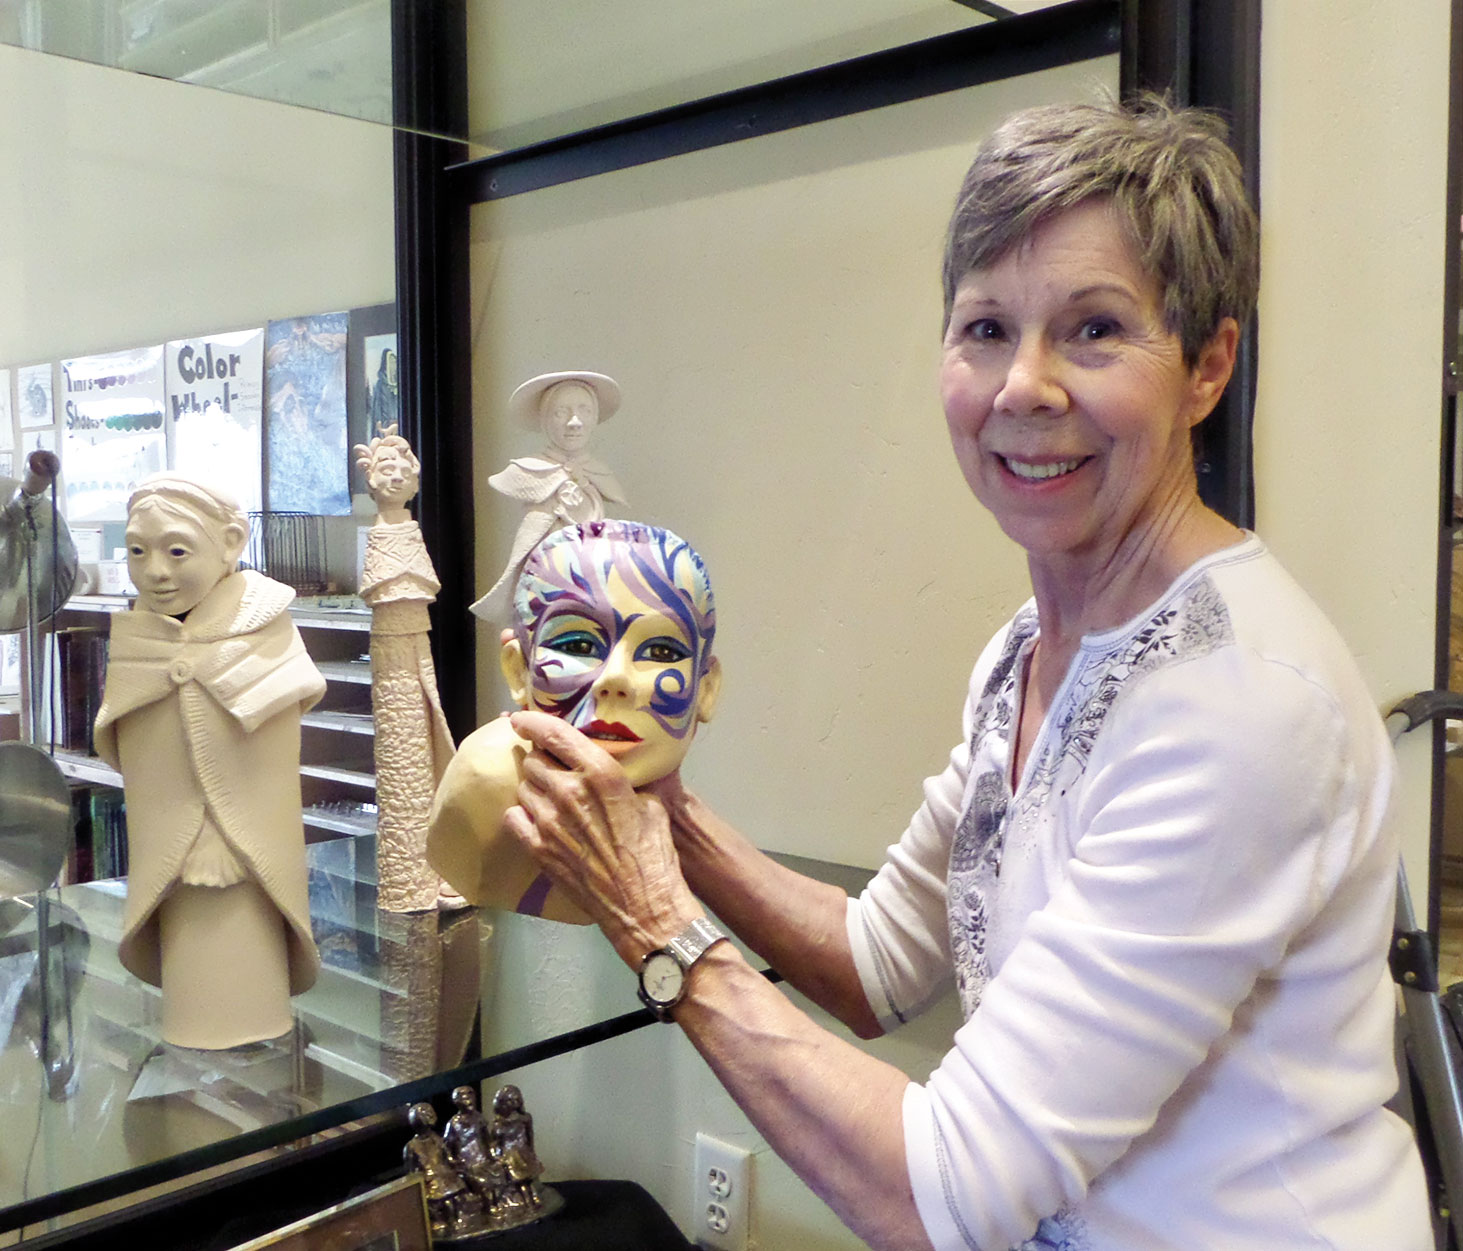 Judie Smothers arranges window